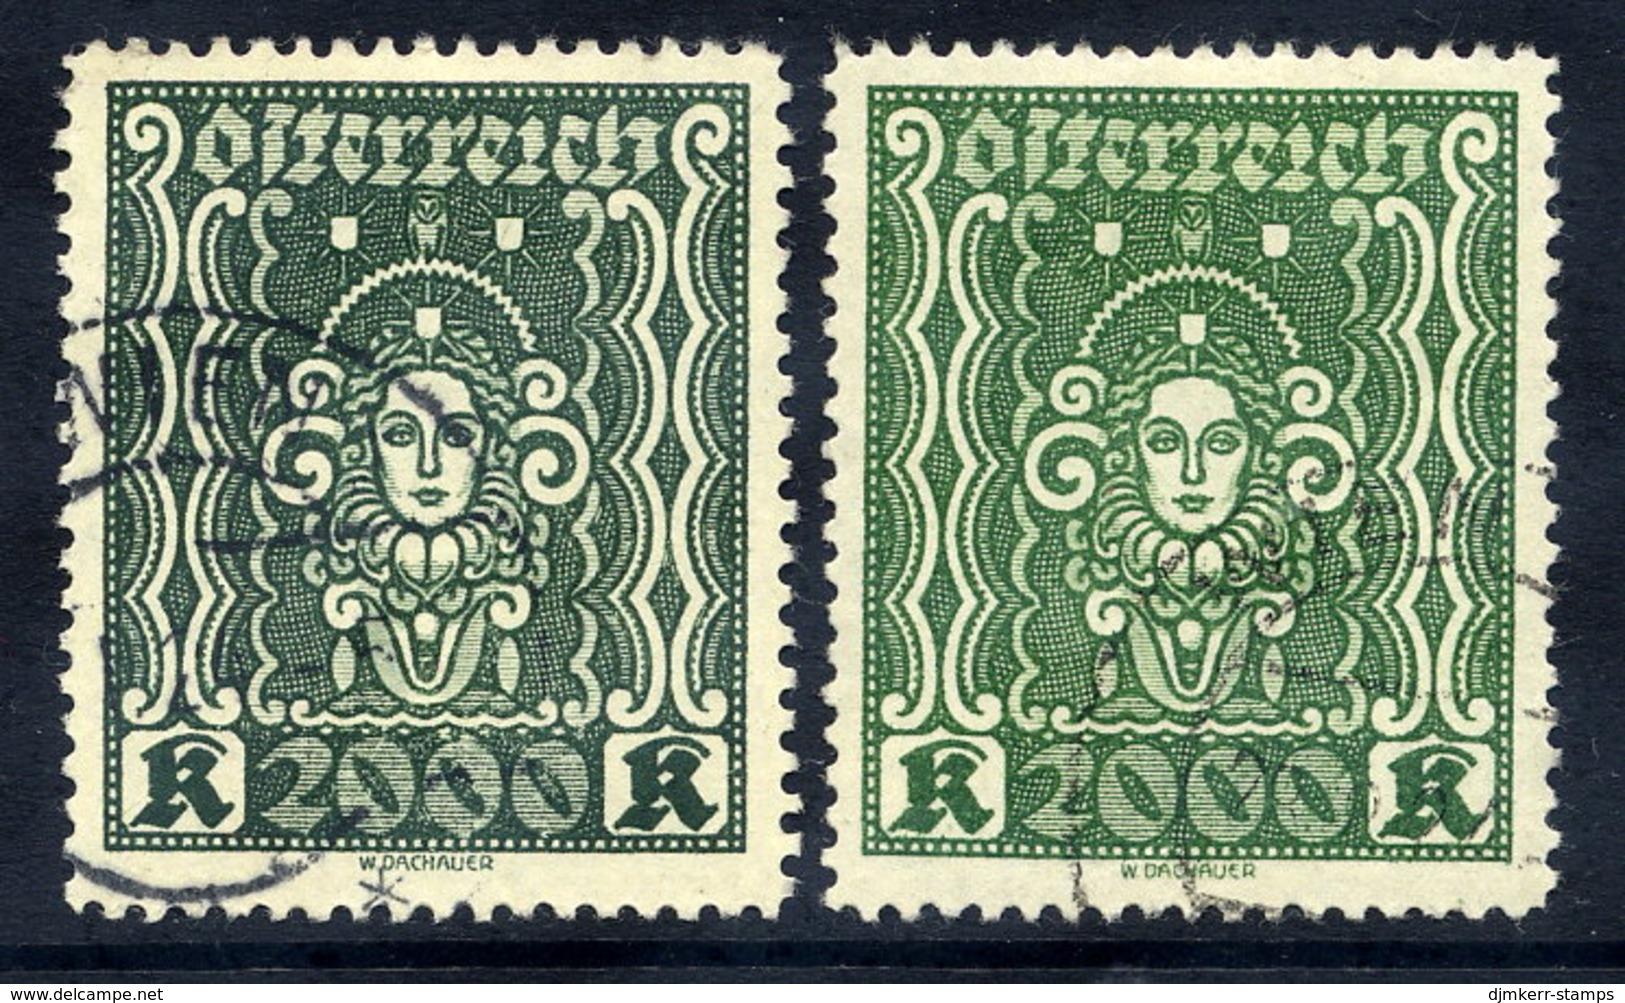 AUSTRIA 1922 Definitive 2000 Kr. In Both Shades Used.  Michel 405Aa-b - Oblitérés